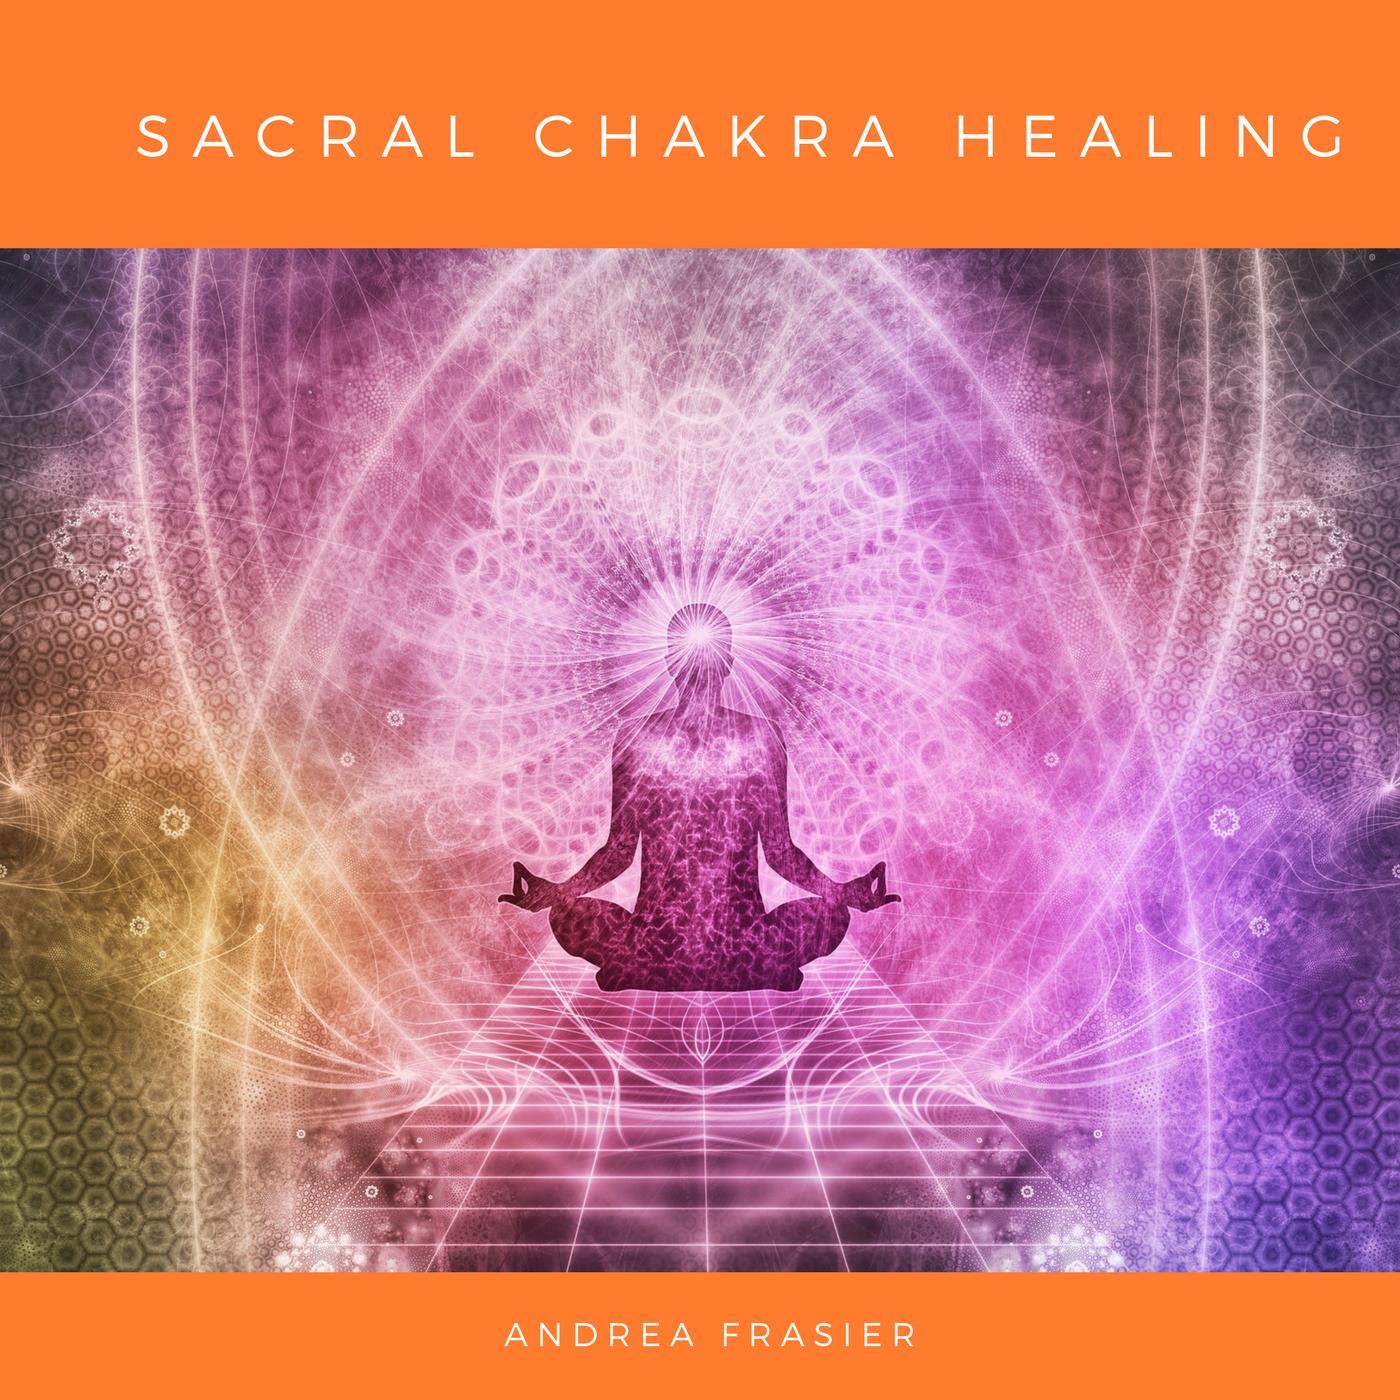 Sacral Chakra Healing Guide